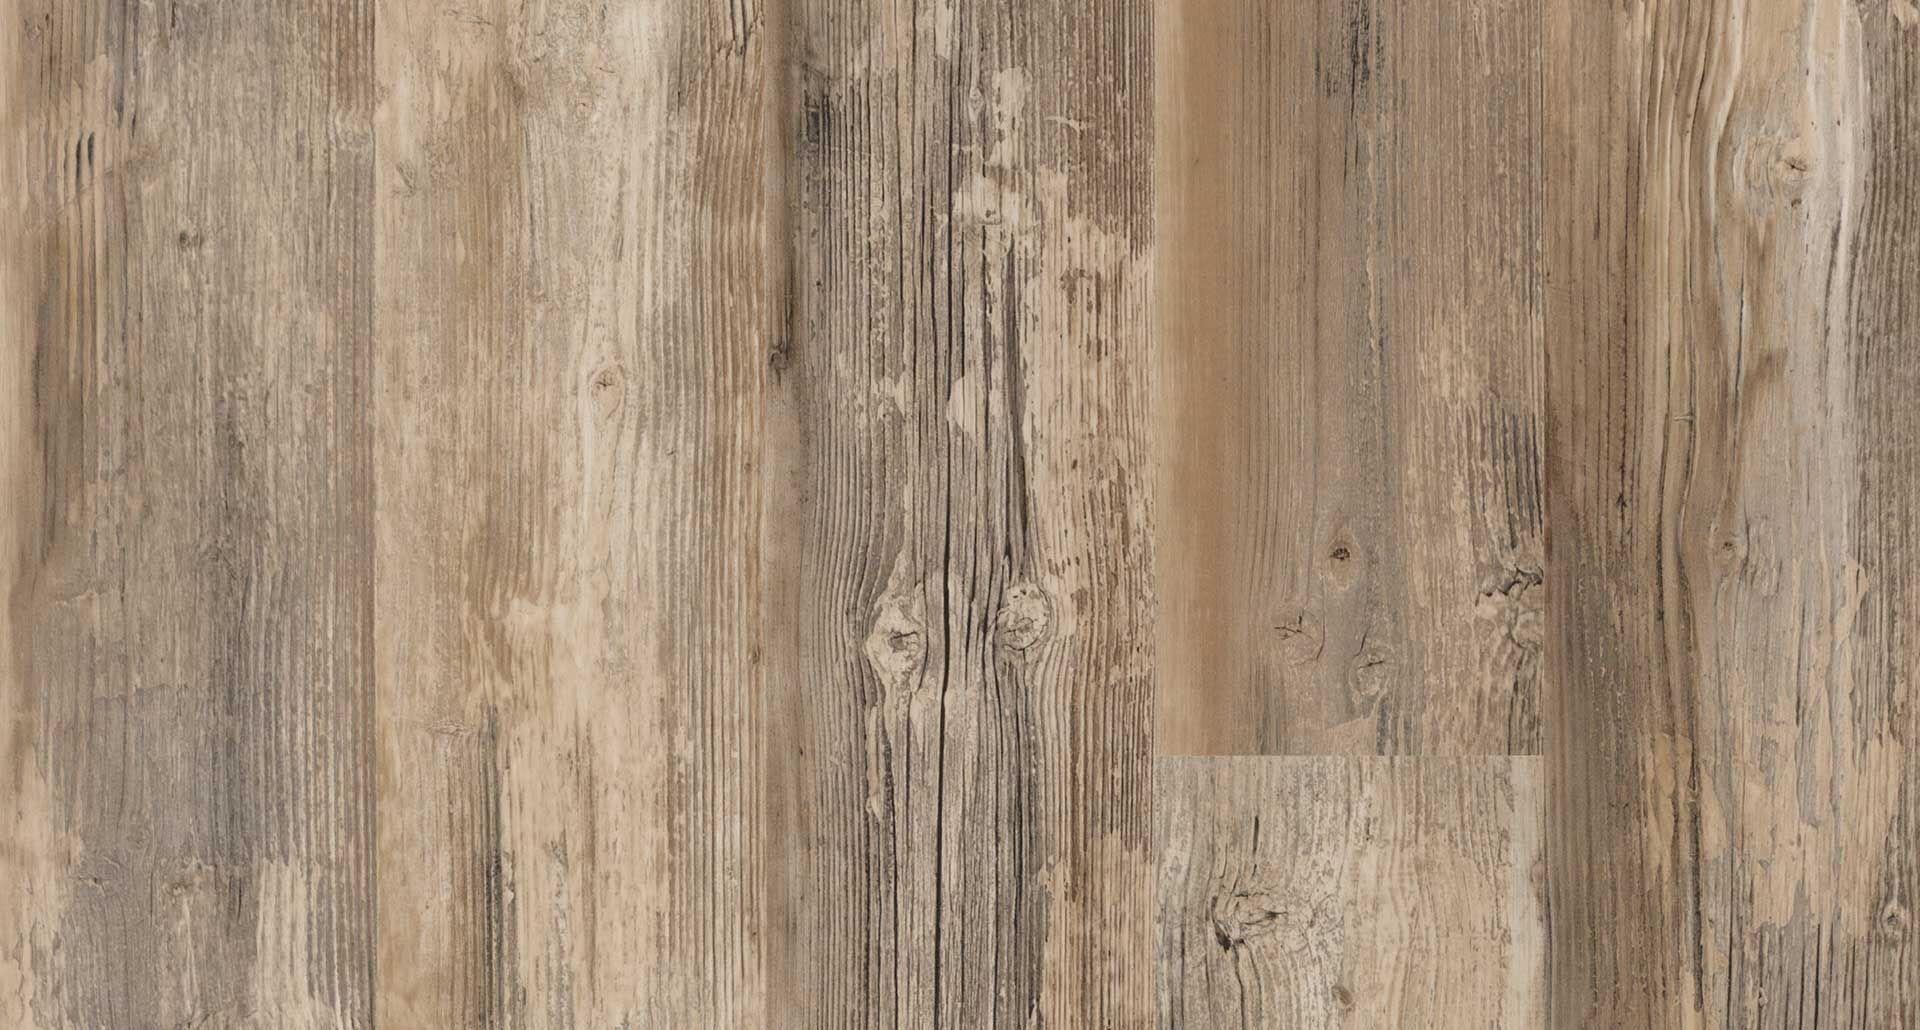 Newport Pine Handscraped Laminate Floor Medium Pine Wood Finish